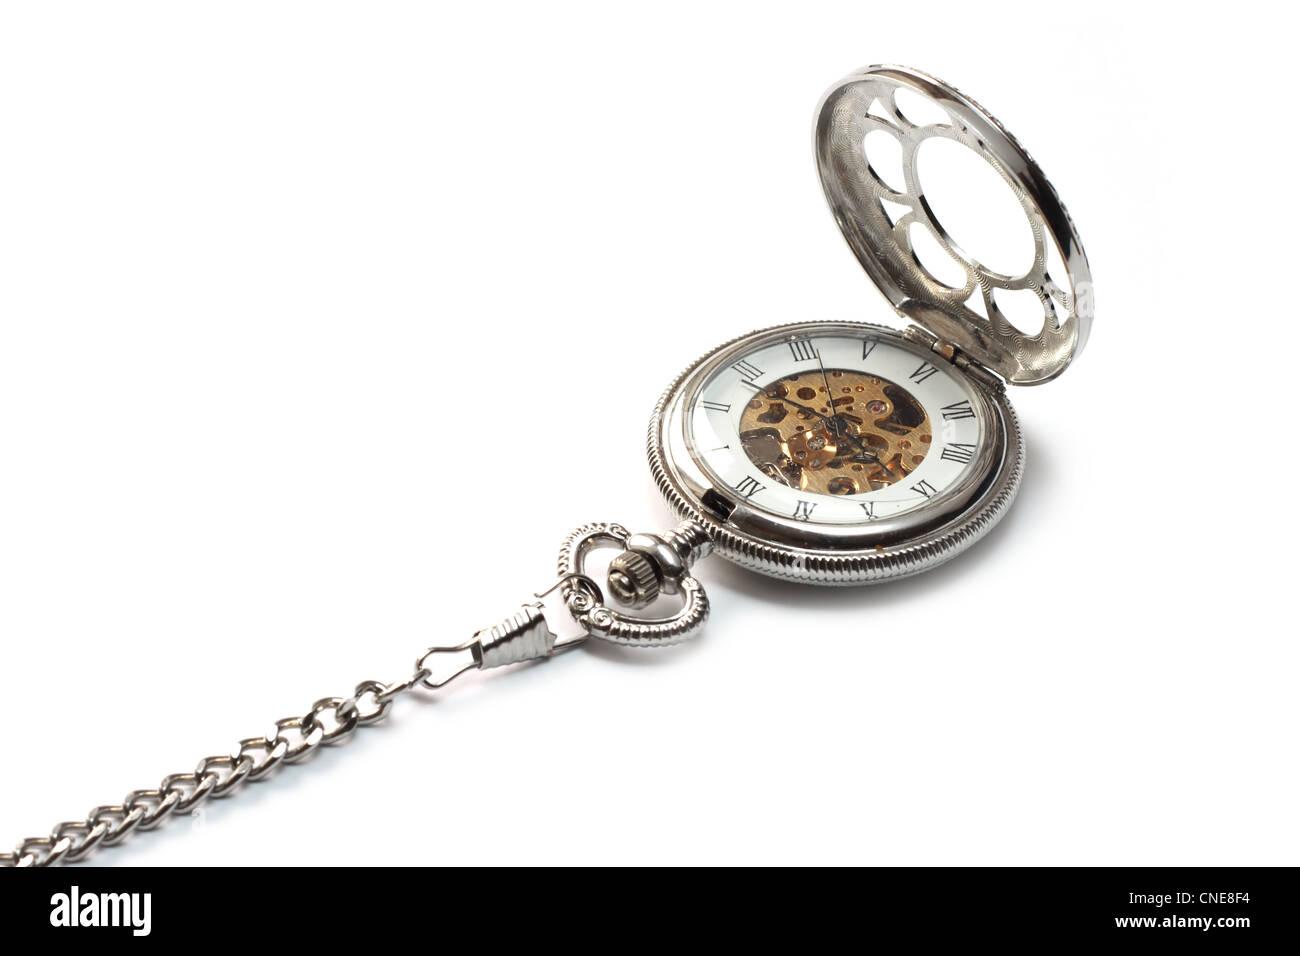 watch isolated on white background - Stock Image